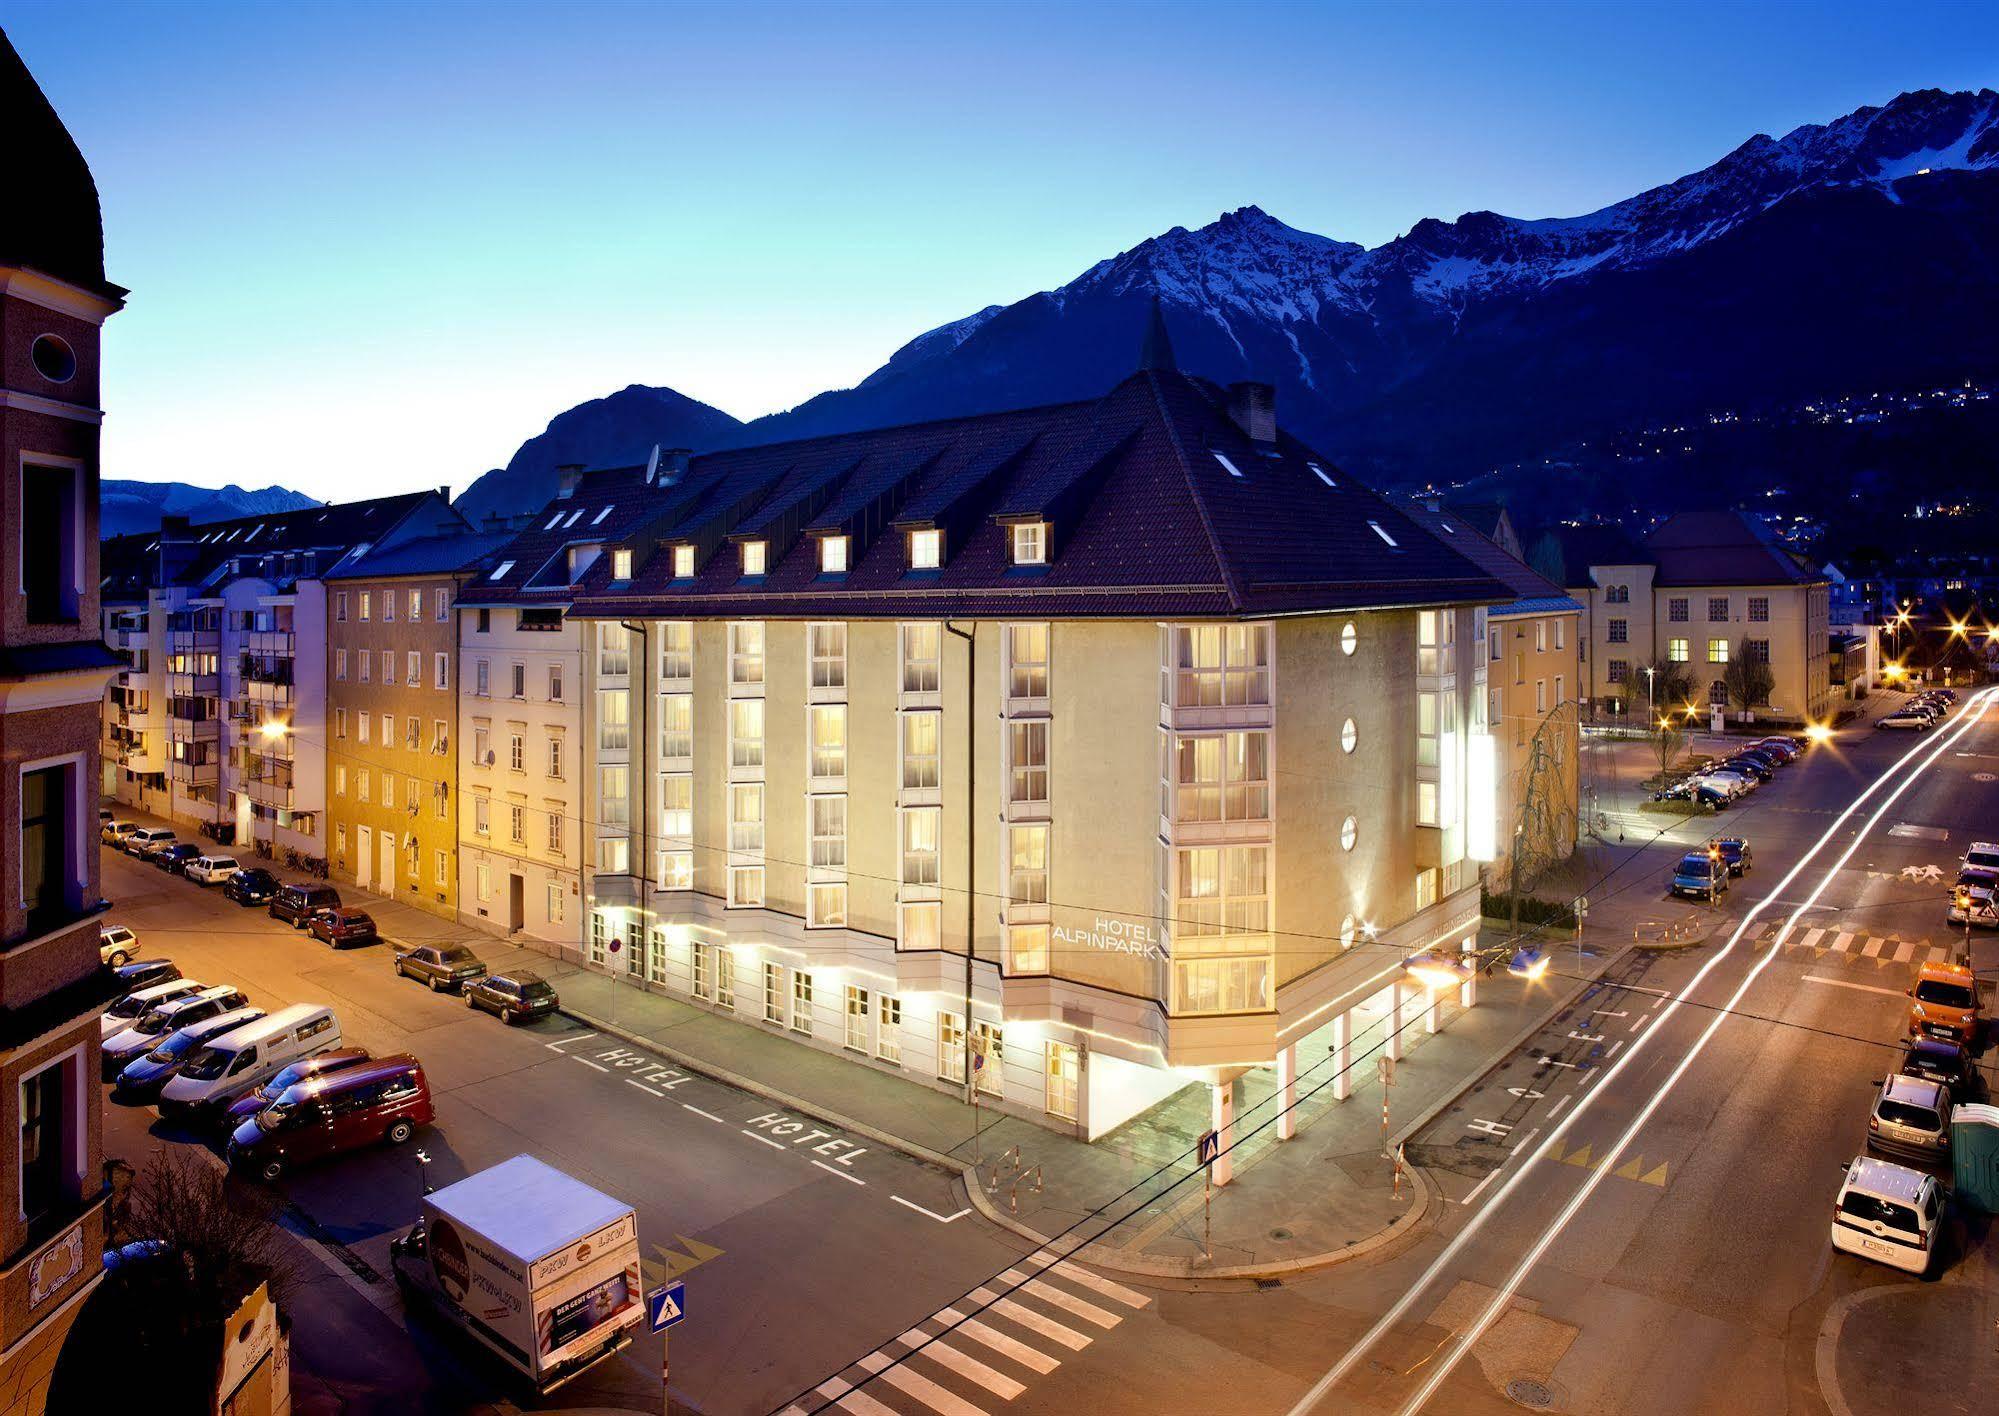 Hotels In Insbruck